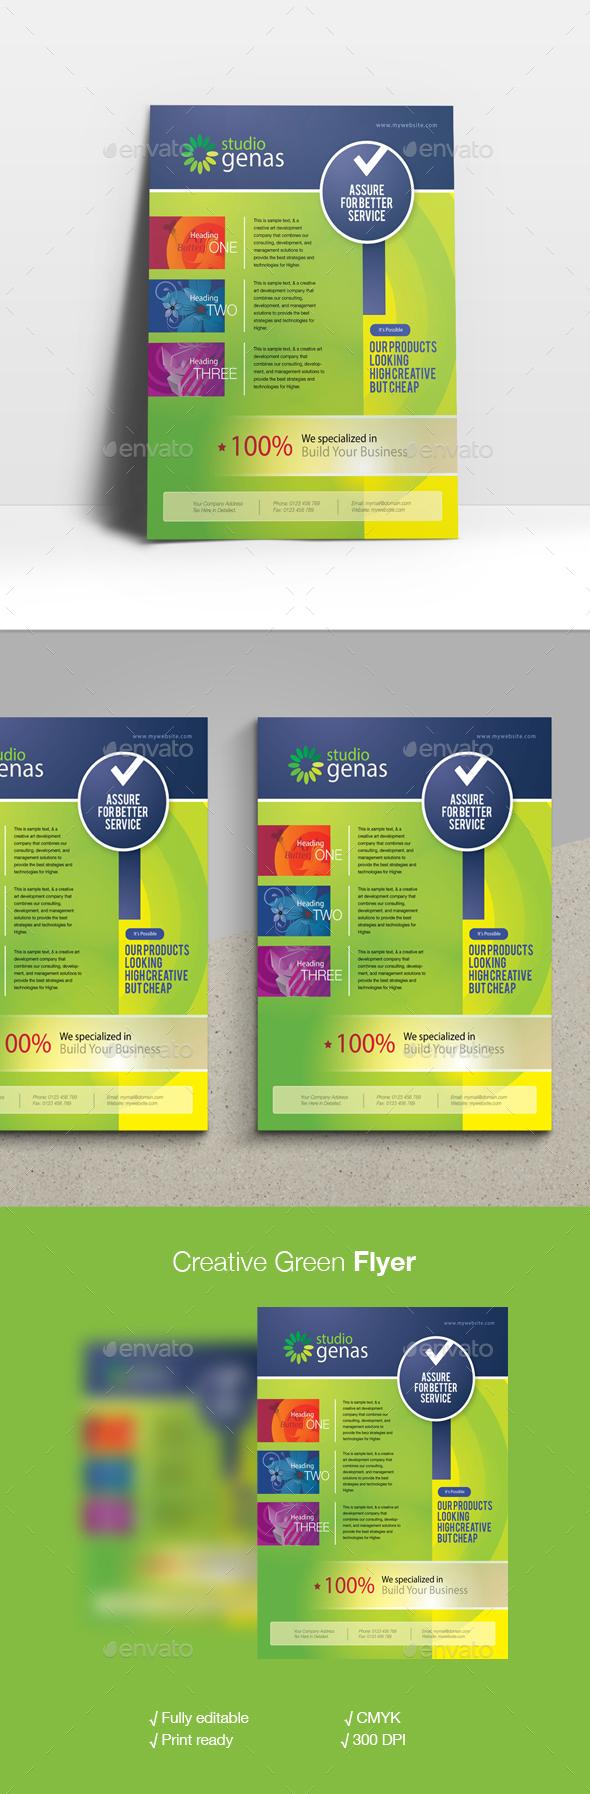 Creative Green Flyer - Corporate Flyers